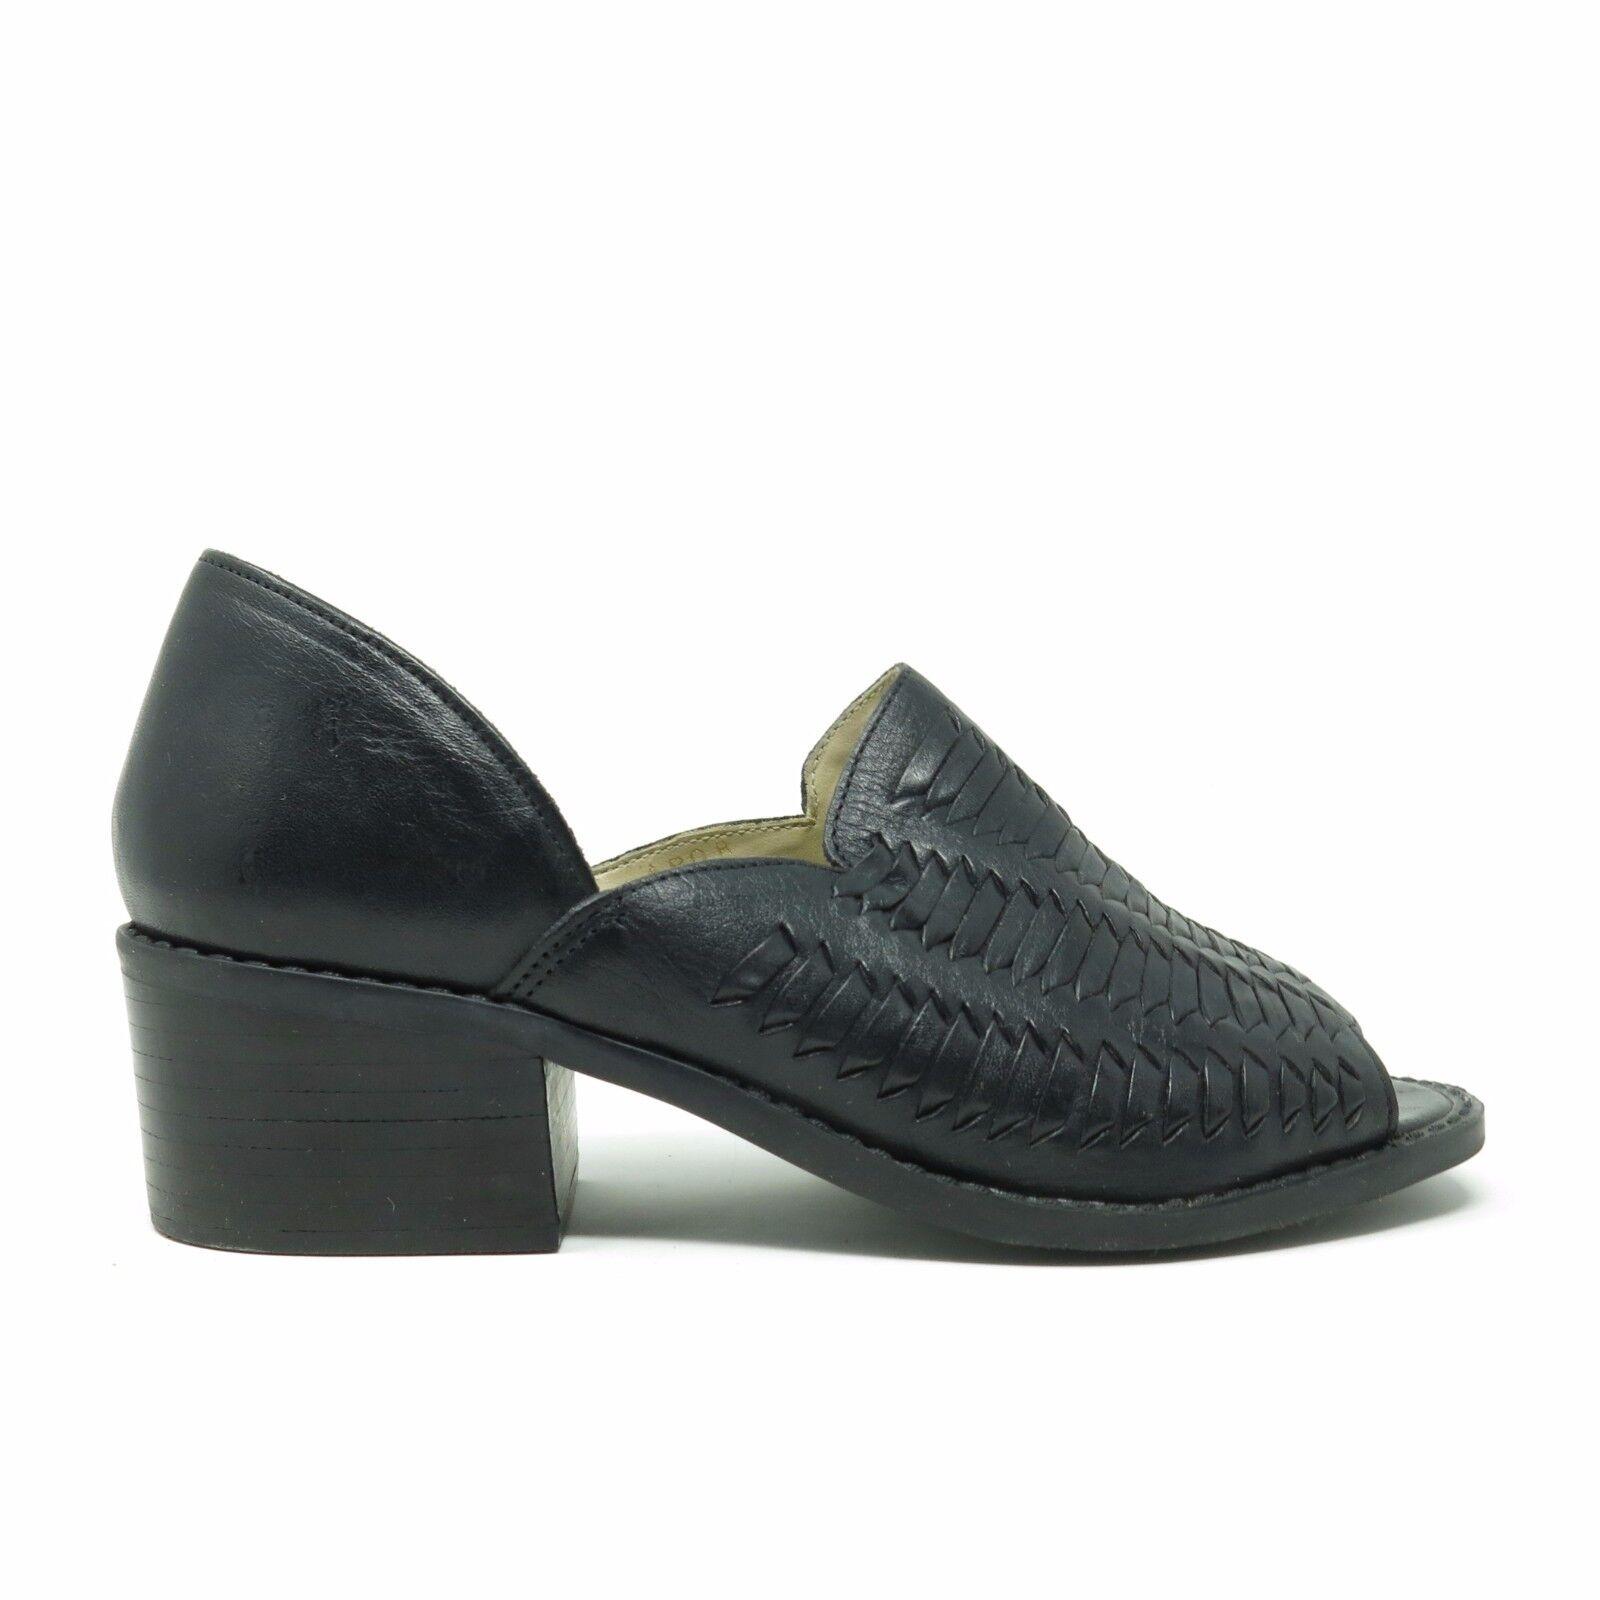 Vtg 90's Woven Black Leather Minimalist Peep Toe Cutout Ankle Bootie Sandals 7.5